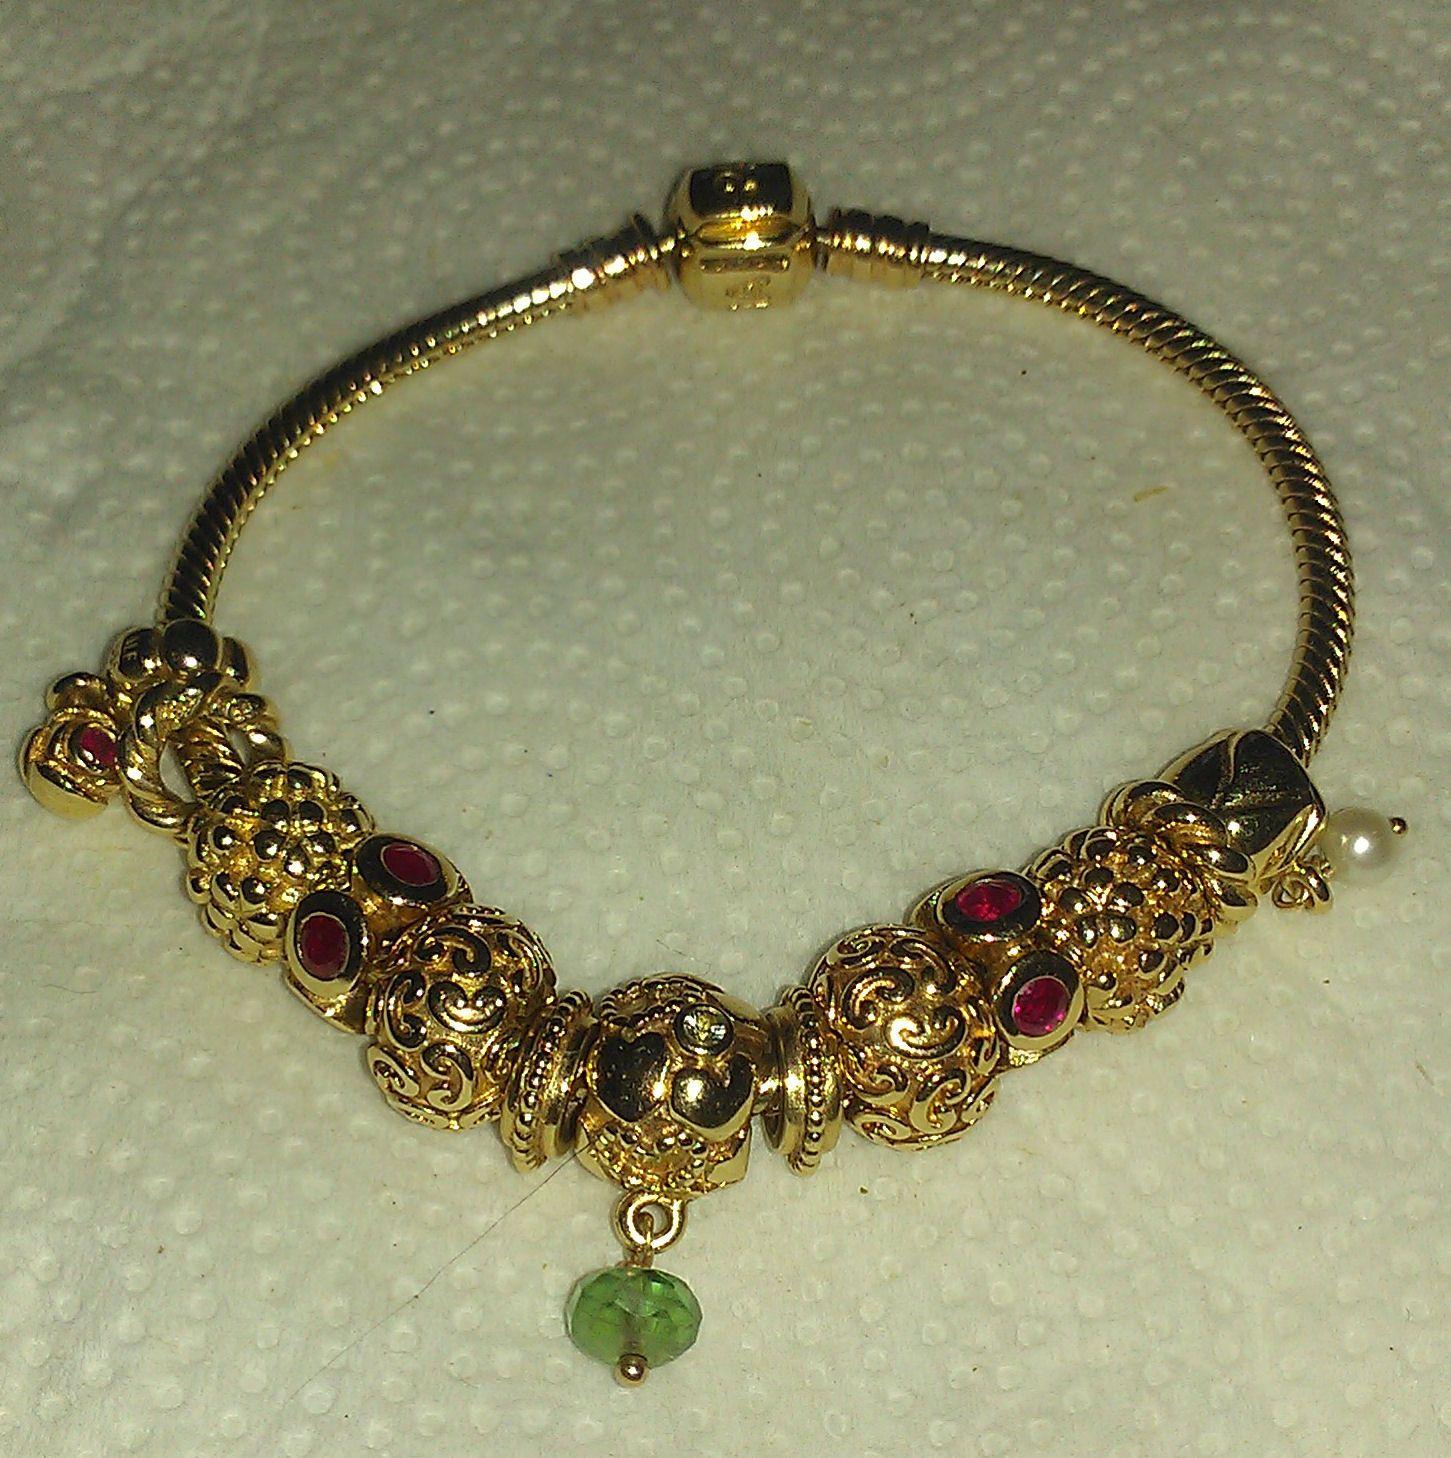 a7863945a pandora 14k gold bracelet with murano - Google Search | Pretty ...